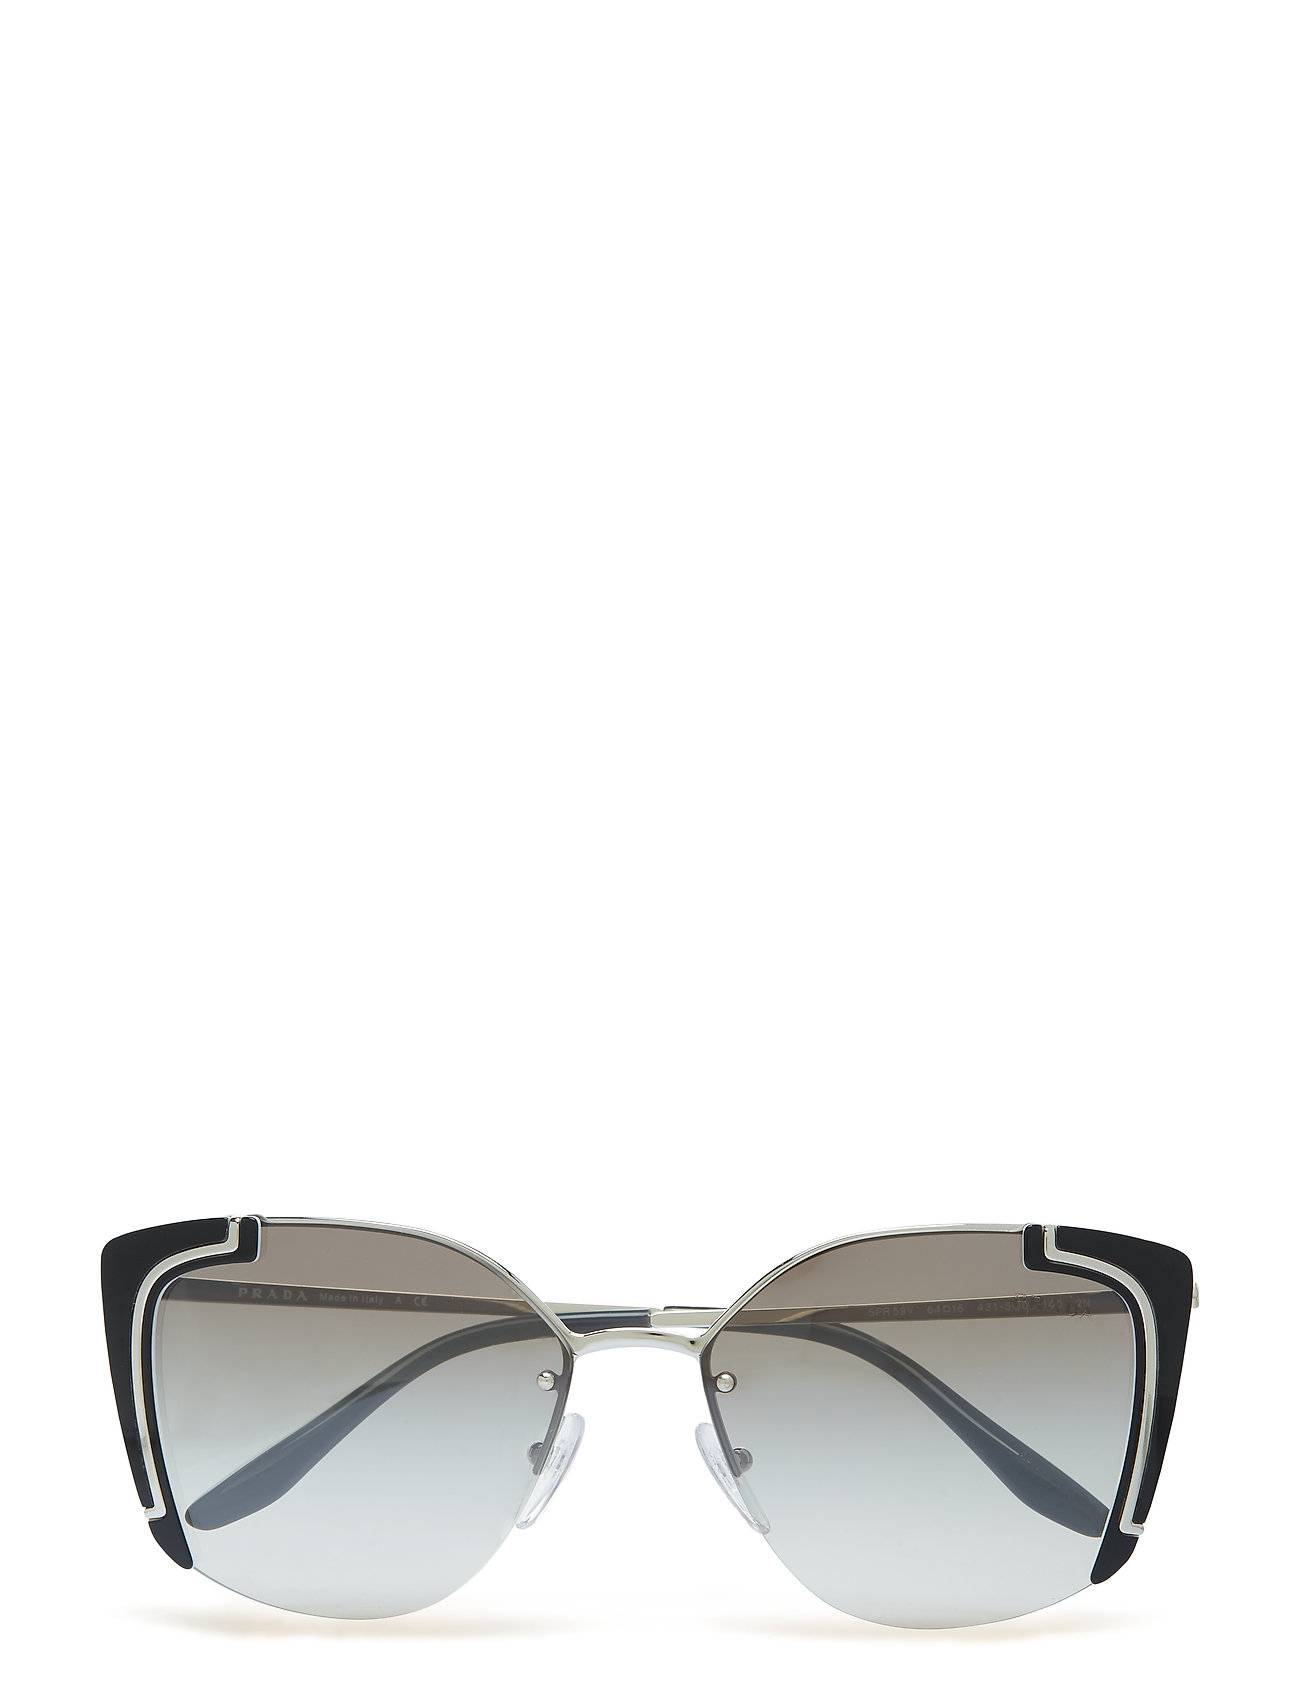 Image of Prada Sunglasses 0pr 59vs Aurinkolasit Sininen